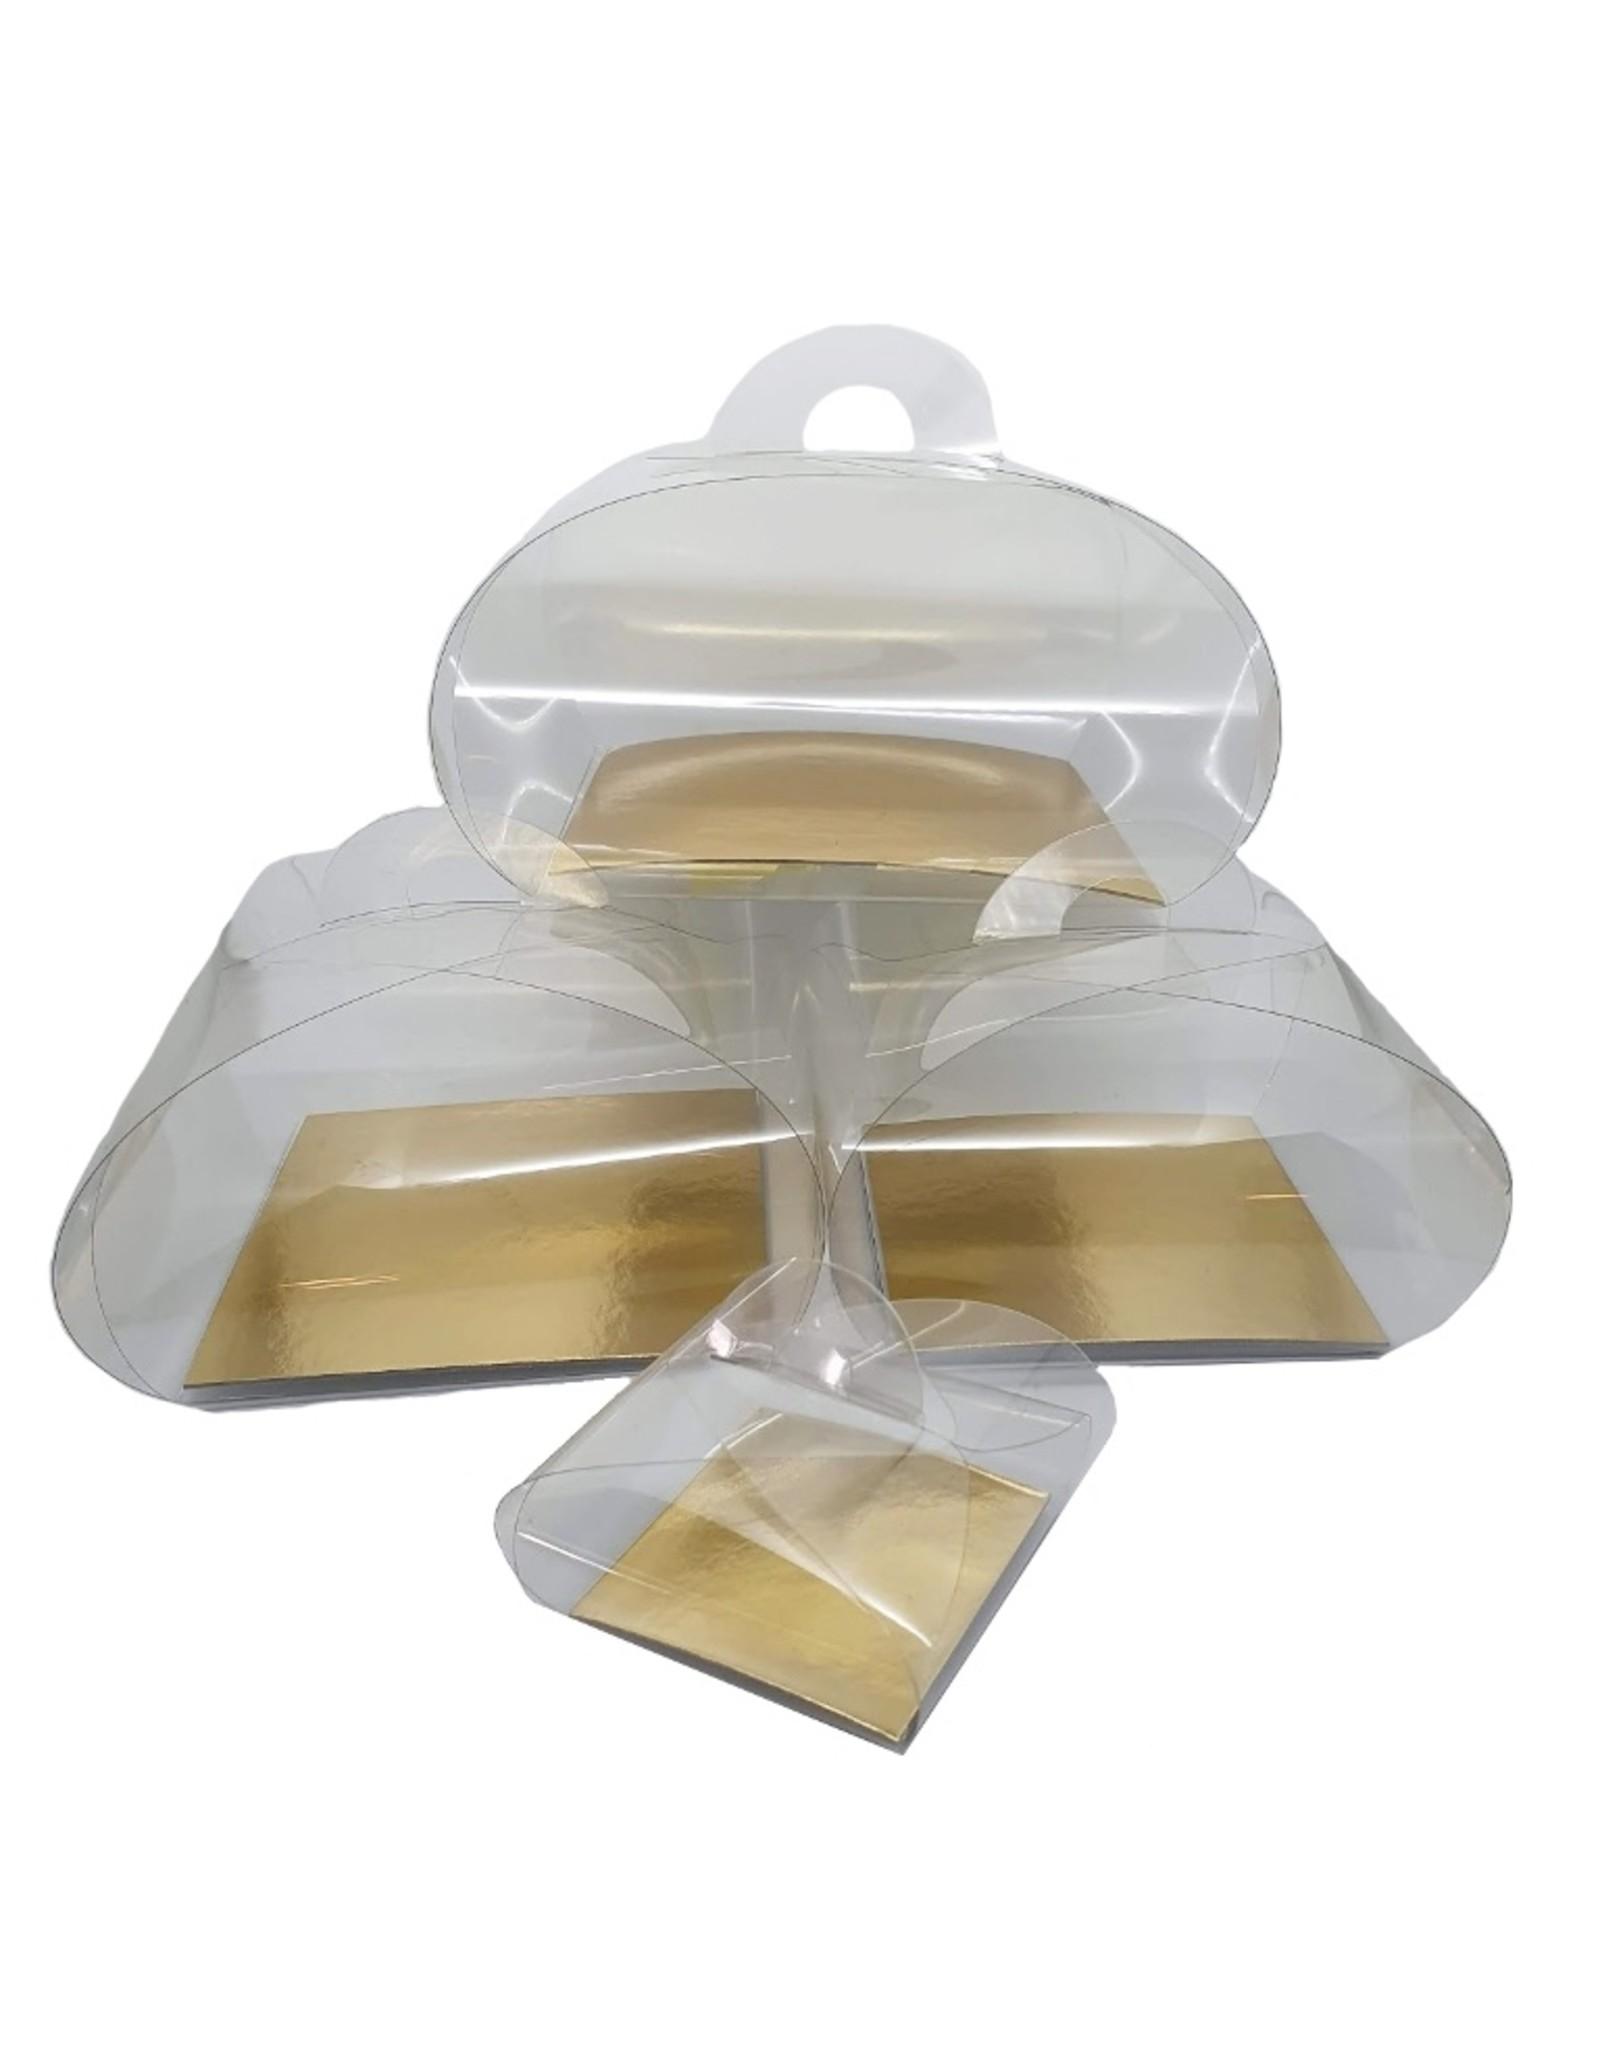 Transparante bundels - diverse maten (per 100 stuks)